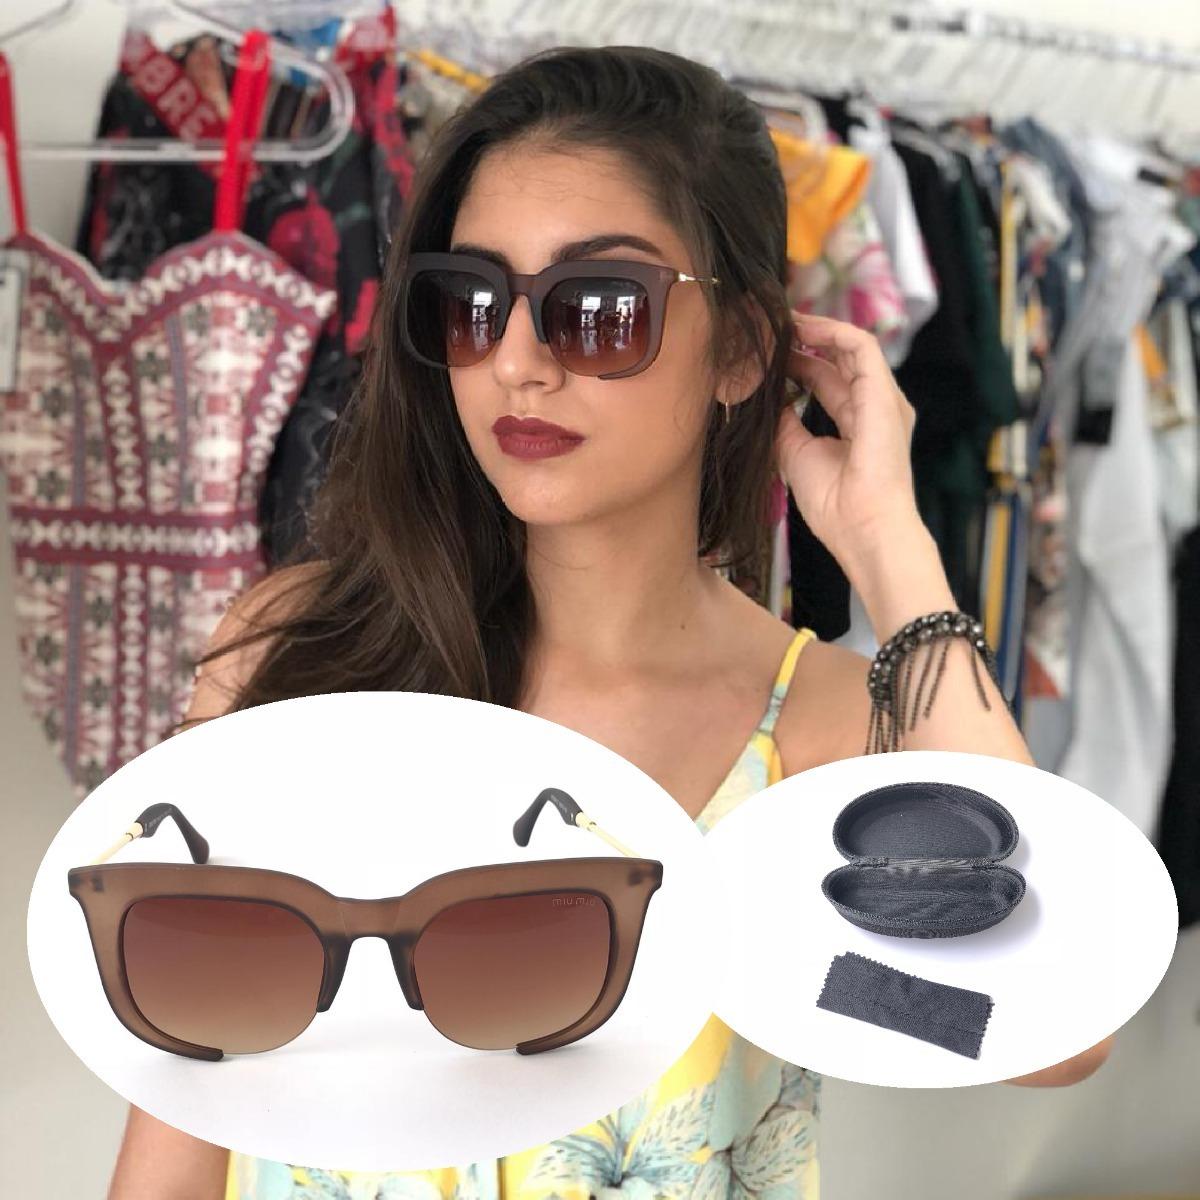 770296853071f óculos de sol feminino clássico quadrado retro grande barato. Carregando  zoom.